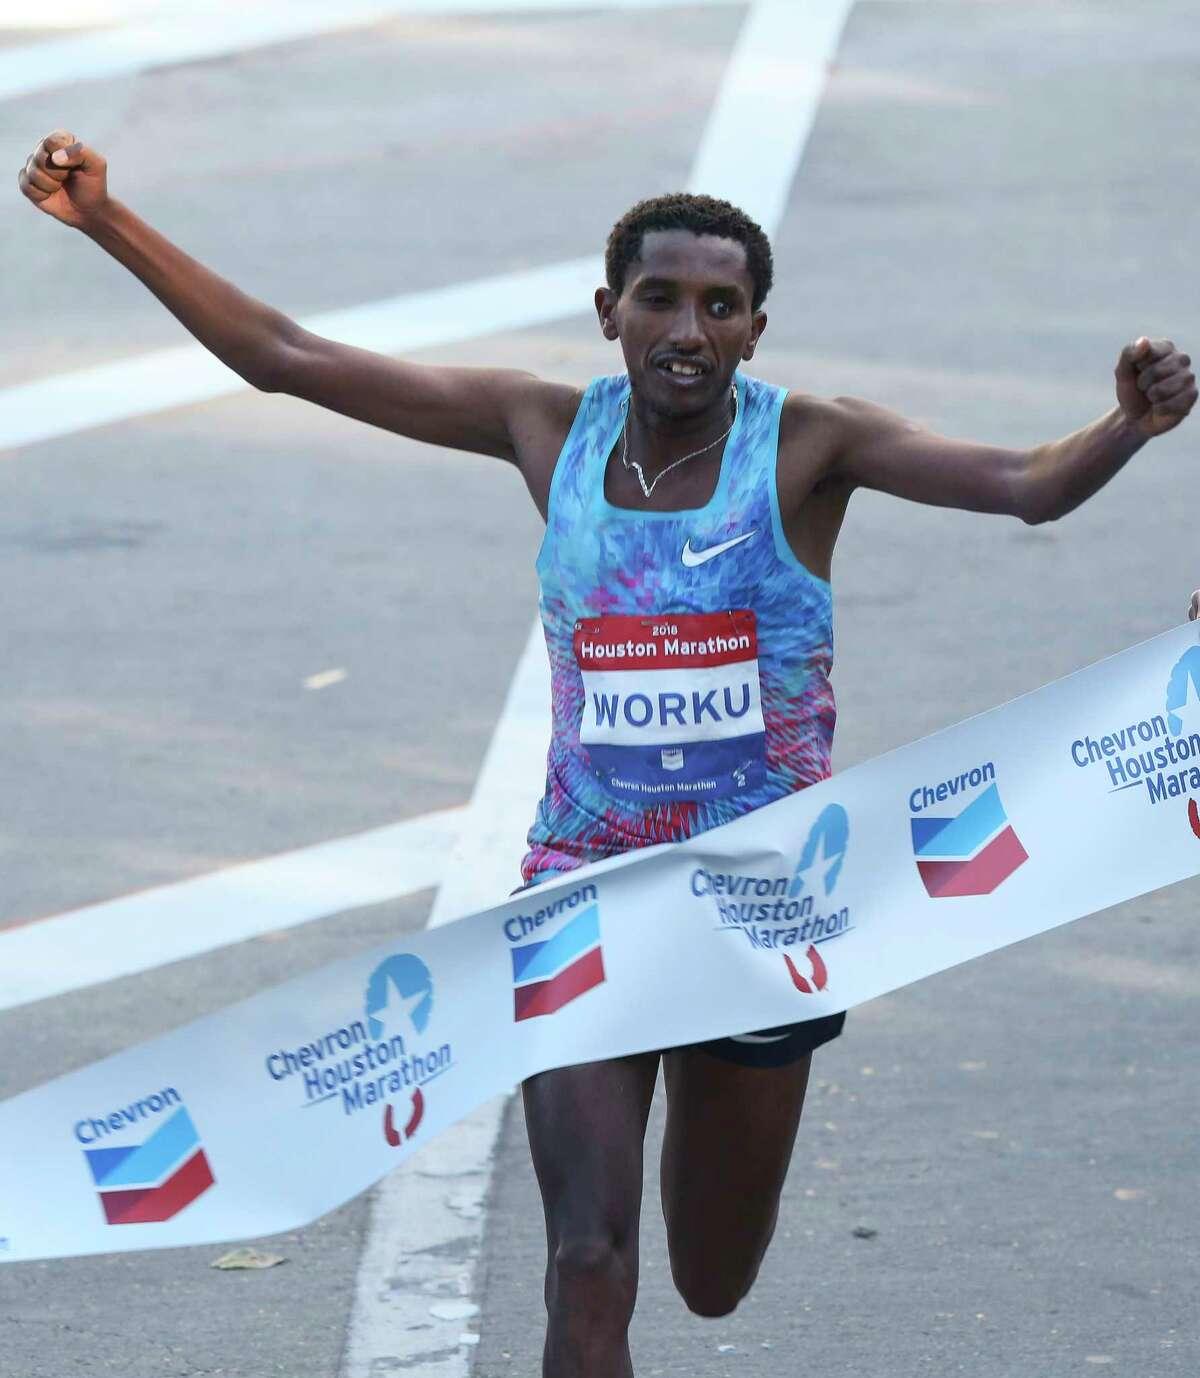 Ethiopia's Bazu Worku added this year's Chevron Houston Marathon men's title to those he won in 2013 and 2014.